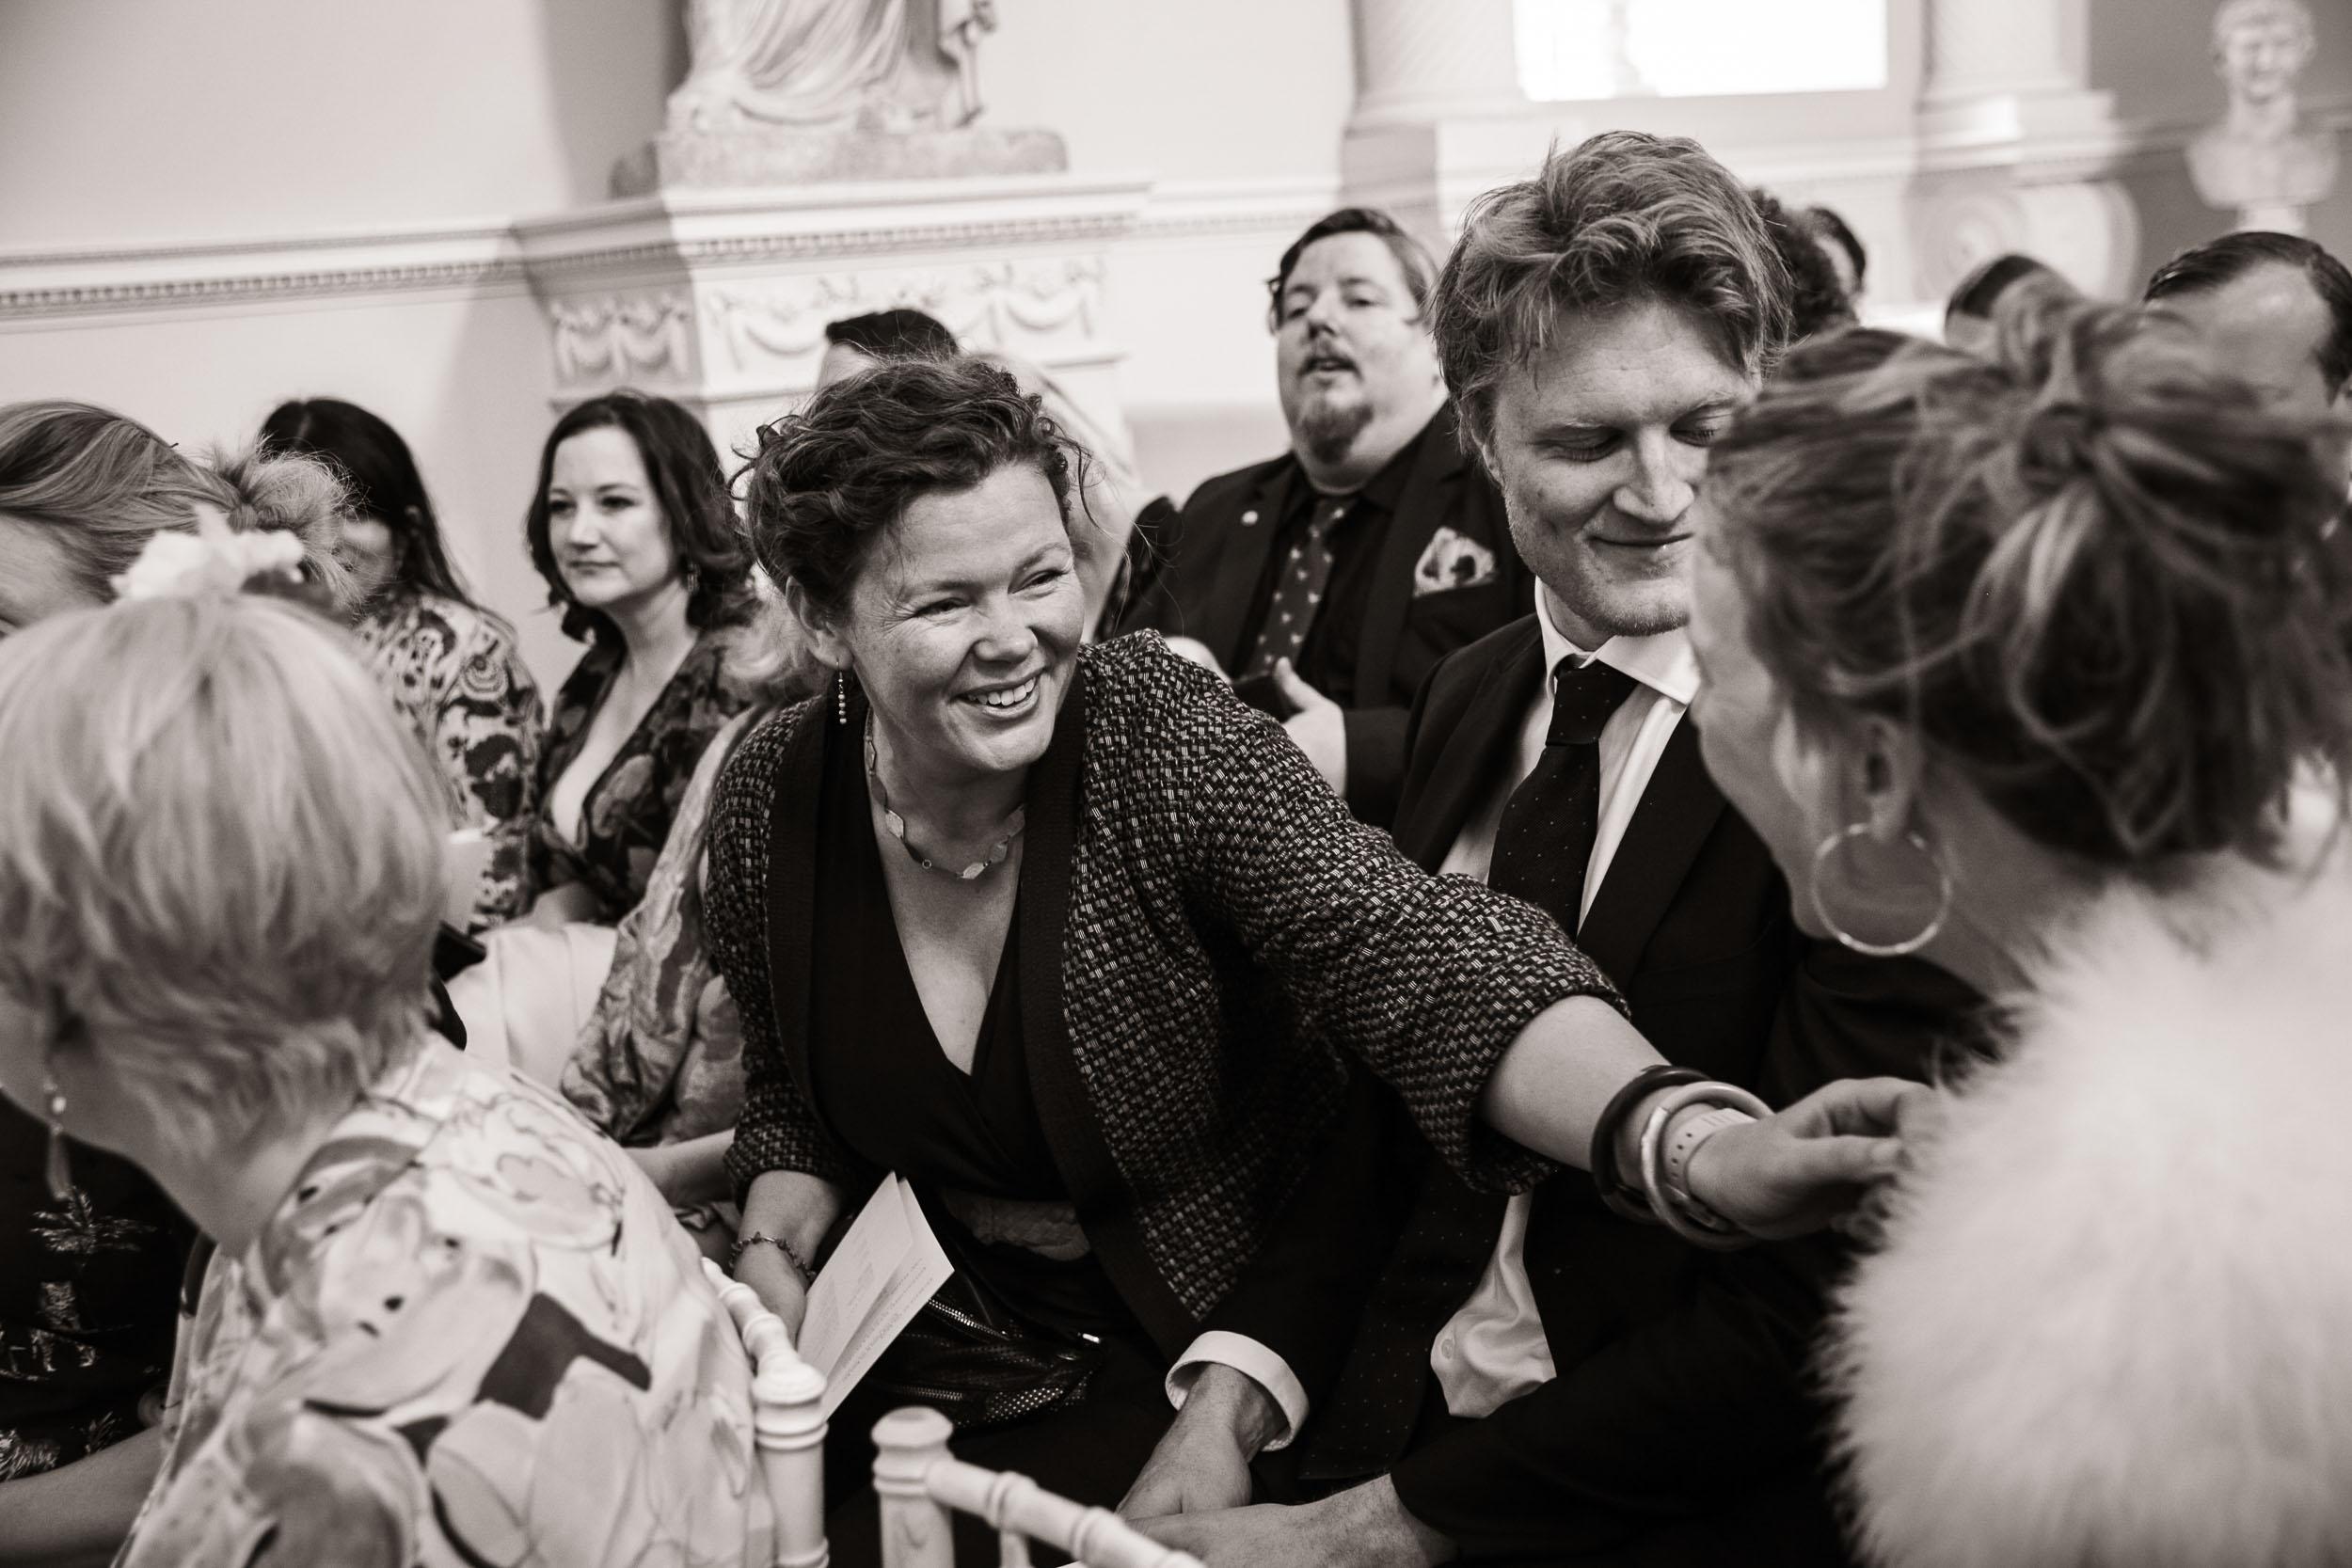 syon-house-wedding-photographer-london 042.jpg